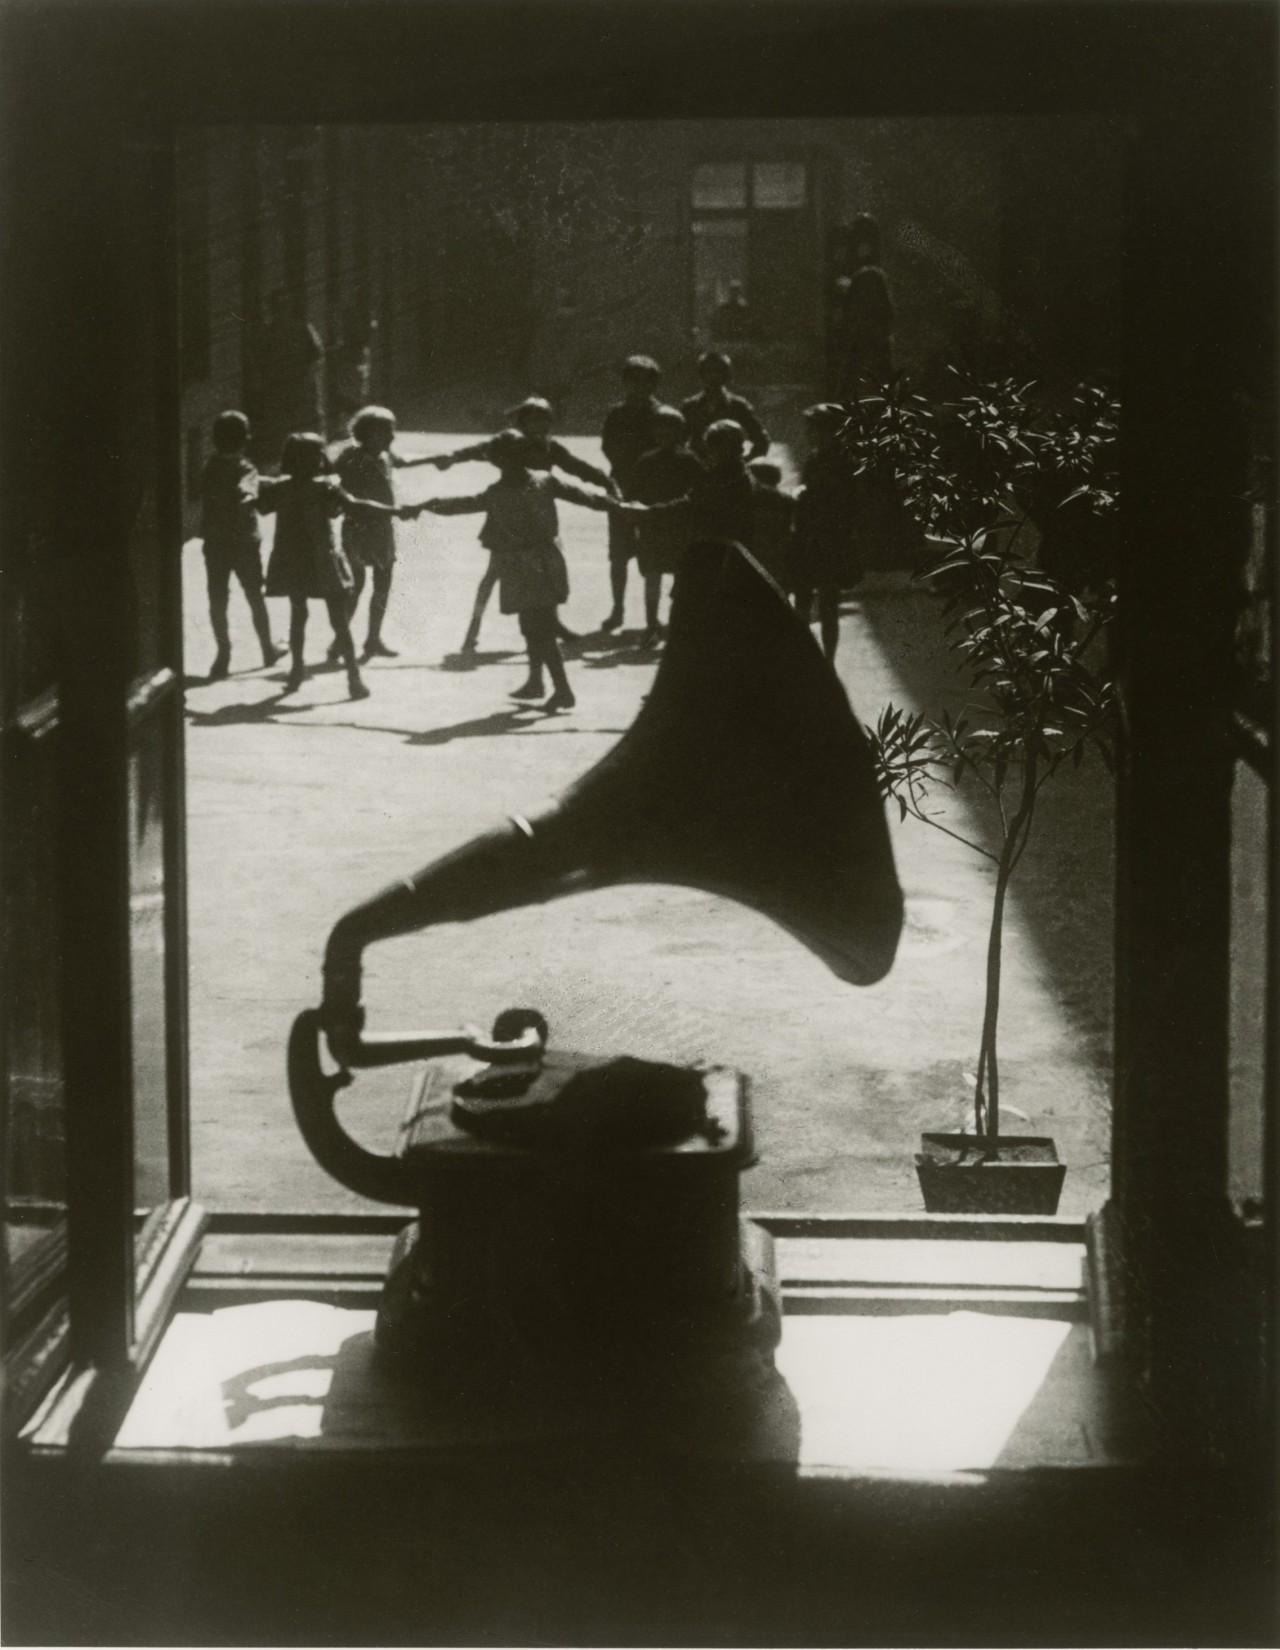 Граммофон, 1923. Фотограф Мартин Мункачи